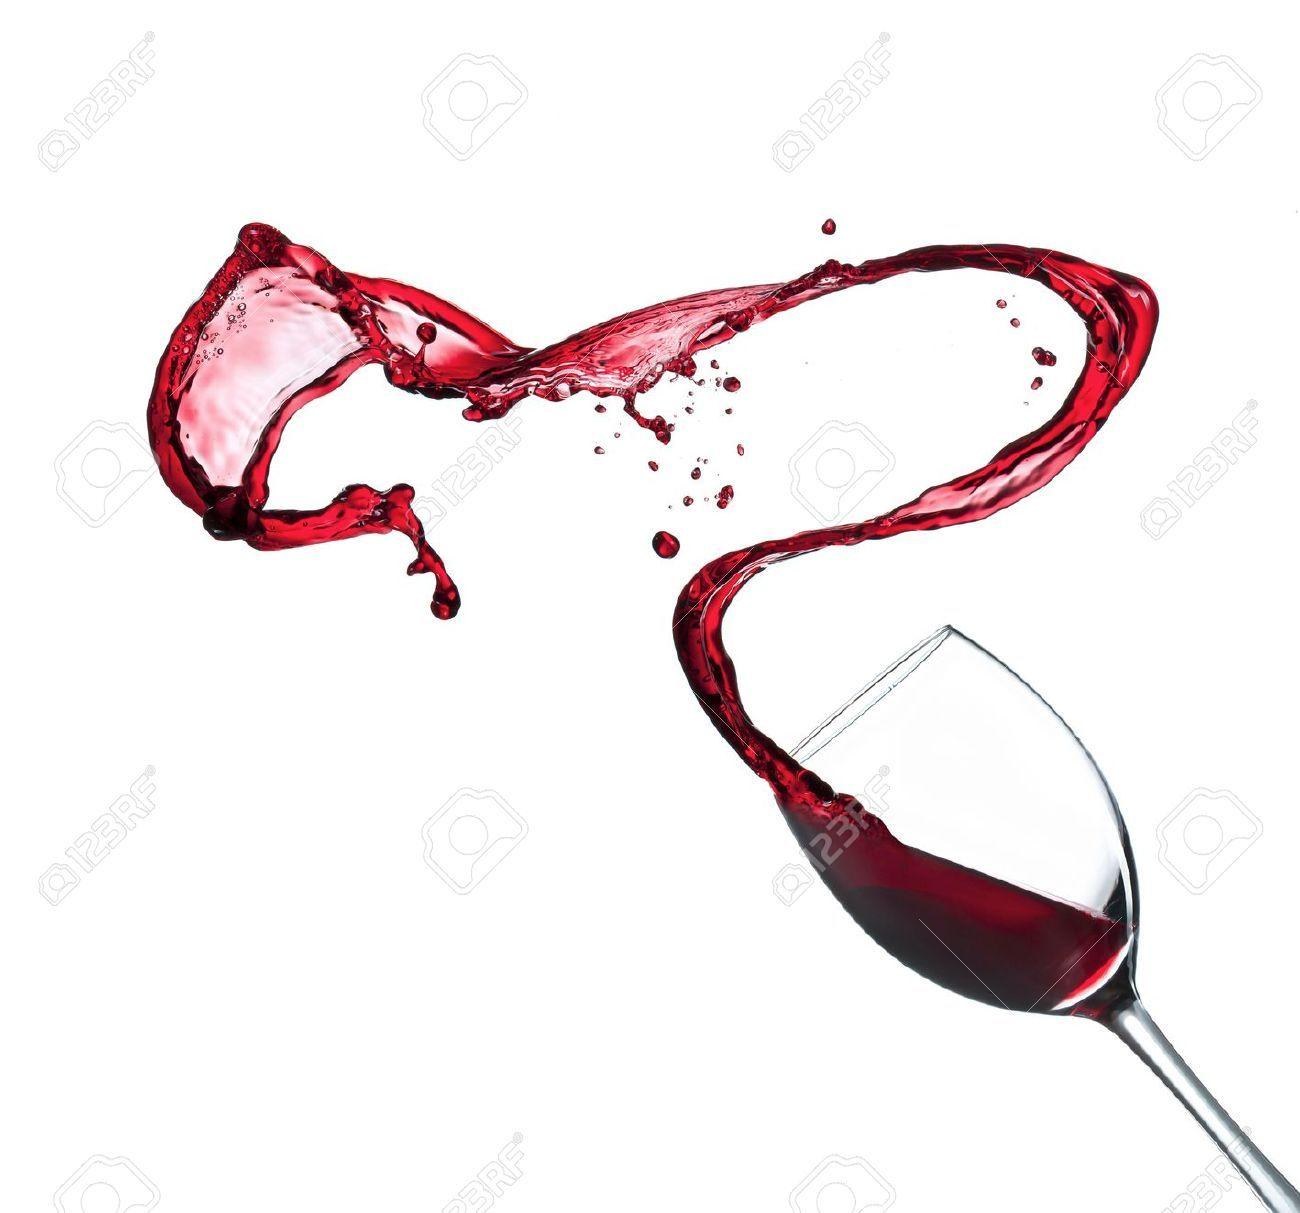 Copa con vino tinto derrama su contenido fondo blanco for Copa vino blanco